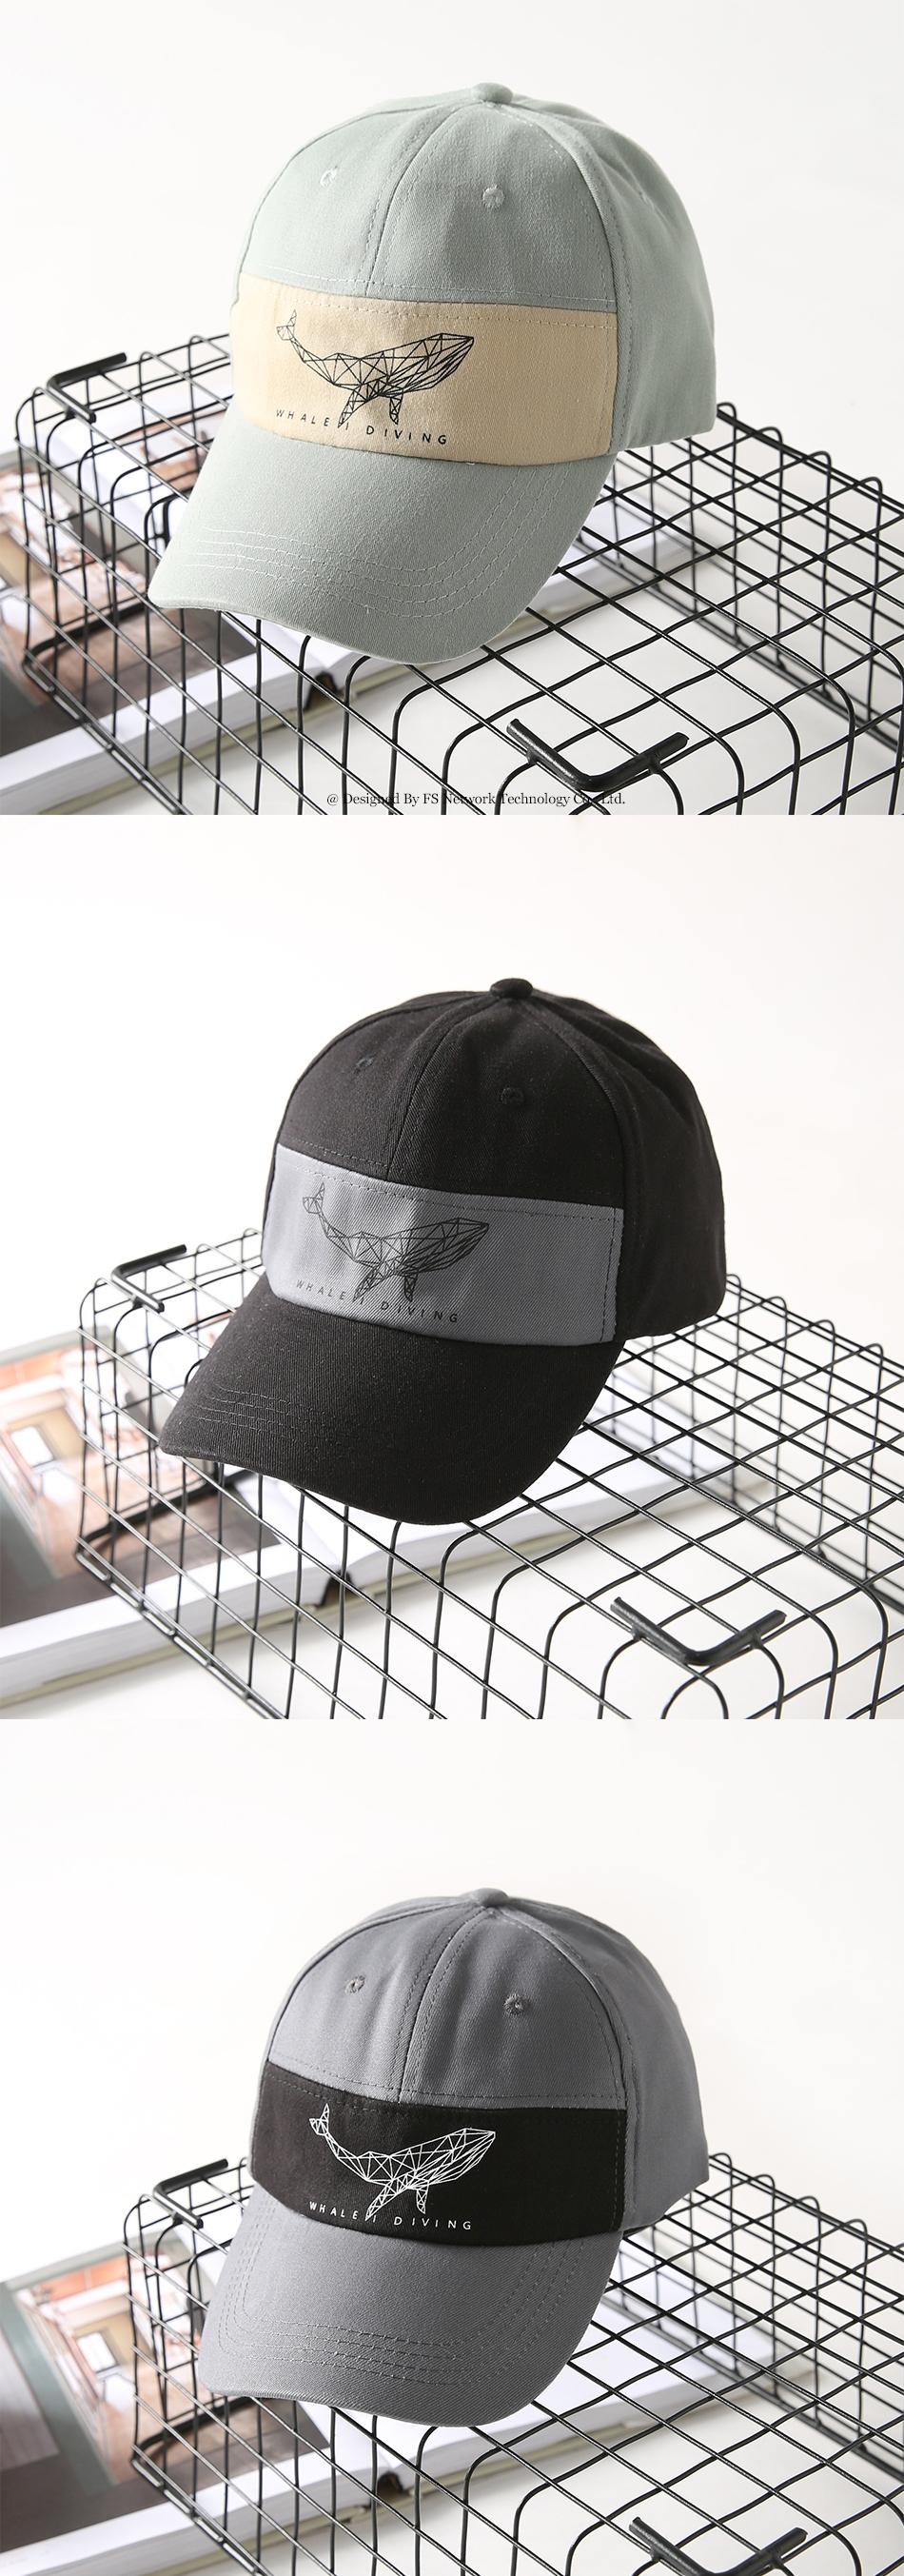 gorras animales